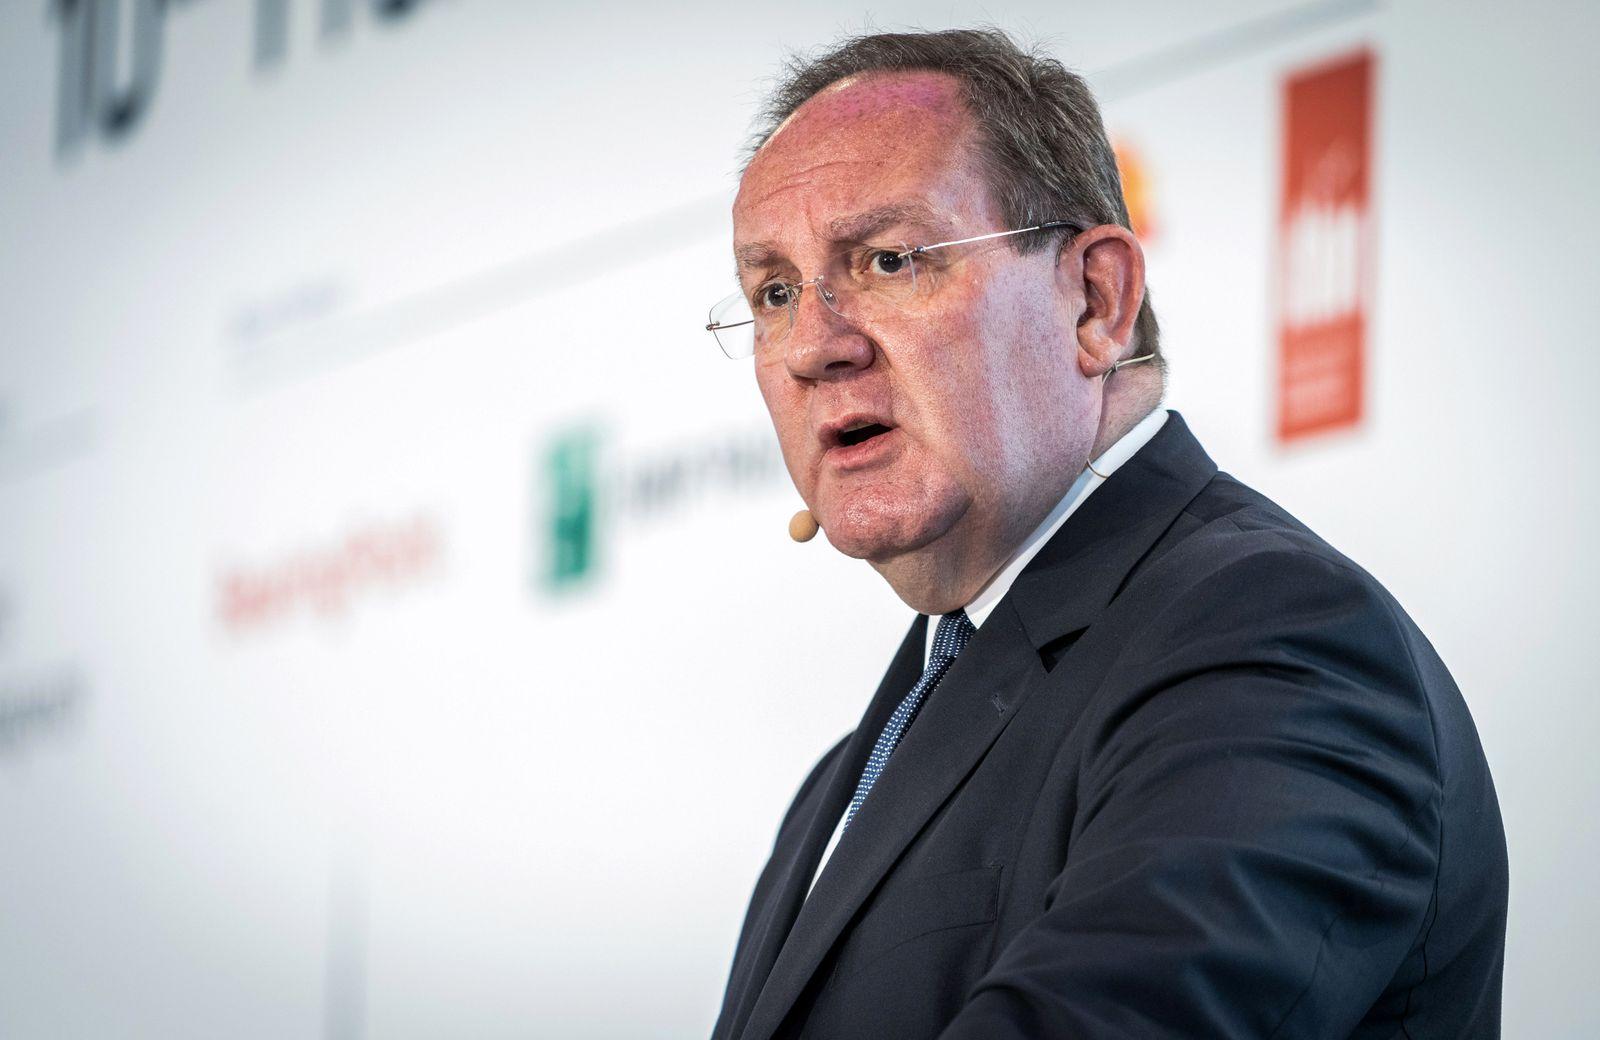 Key Speakers at the Frankfurt Finance Summit